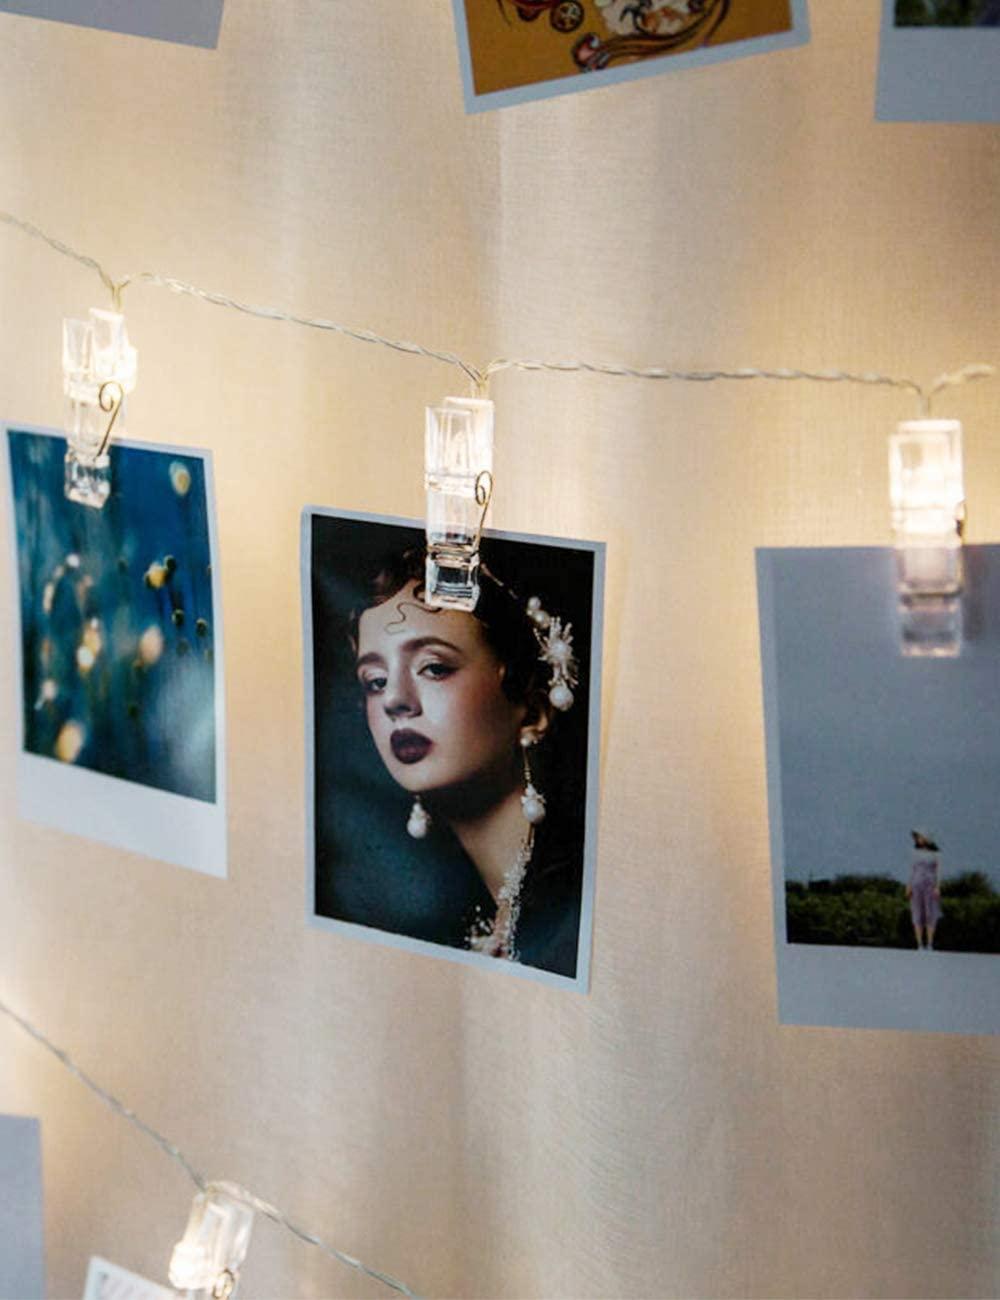 Holiday Lights Warm White LED Photo Clip Light String-9.84 ft 20 LED Flash Proposal Lighting Birthday Decoration Lamp Life Photo Art Photo Hanging Light Clip